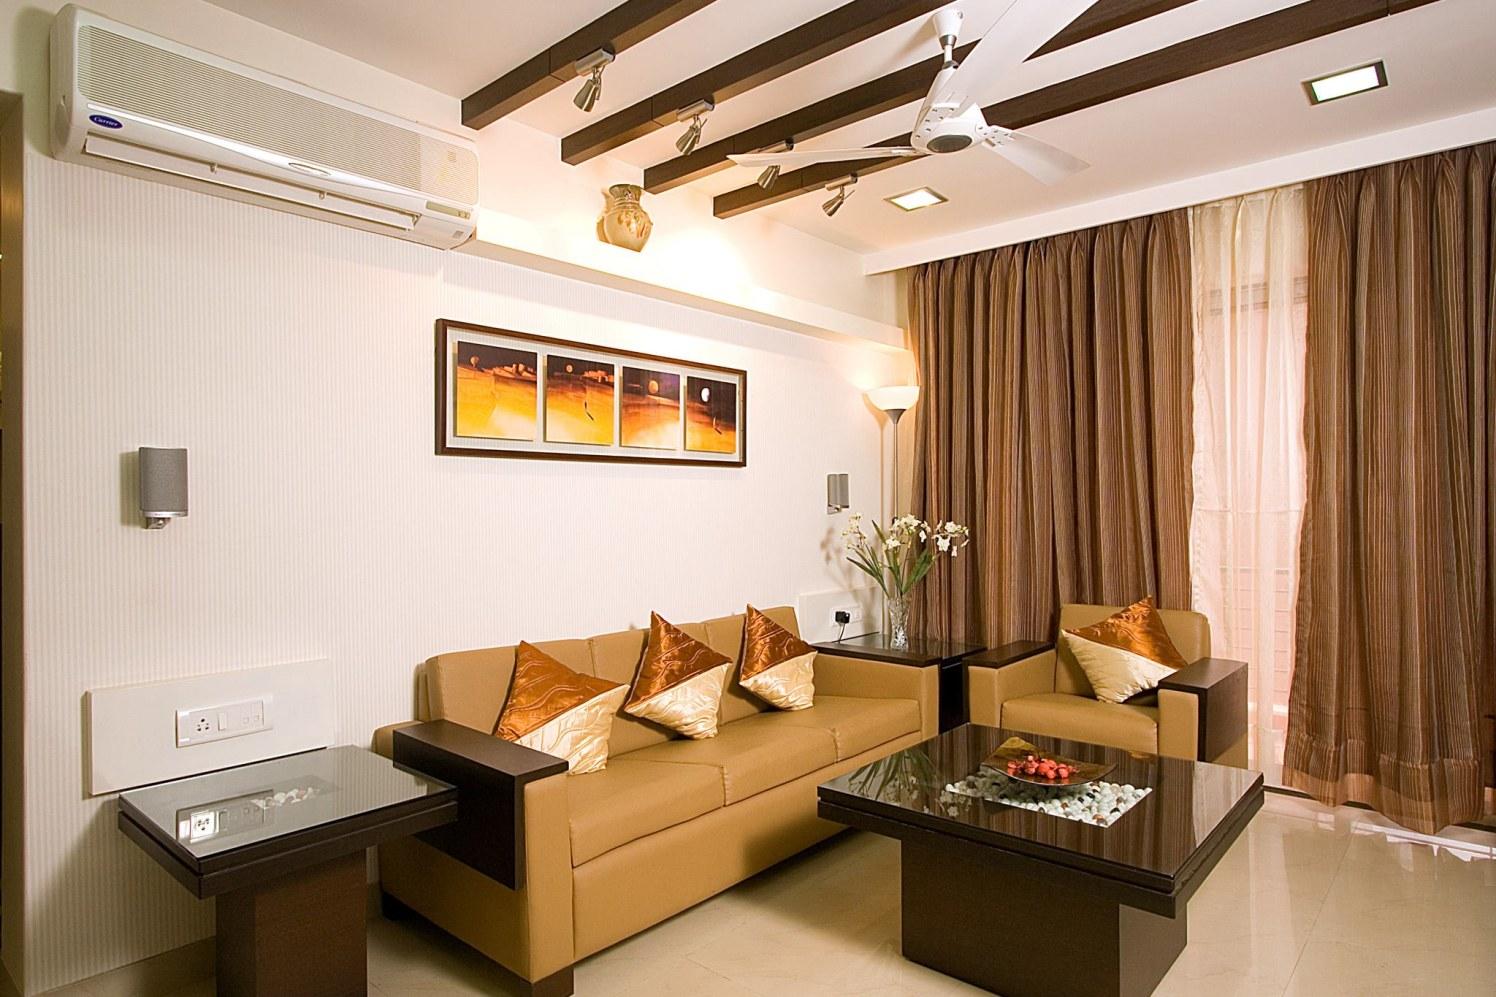 Beige Living Room With Shiny Cushions by Vikas Bhoir Living-room Contemporary | Interior Design Photos & Ideas